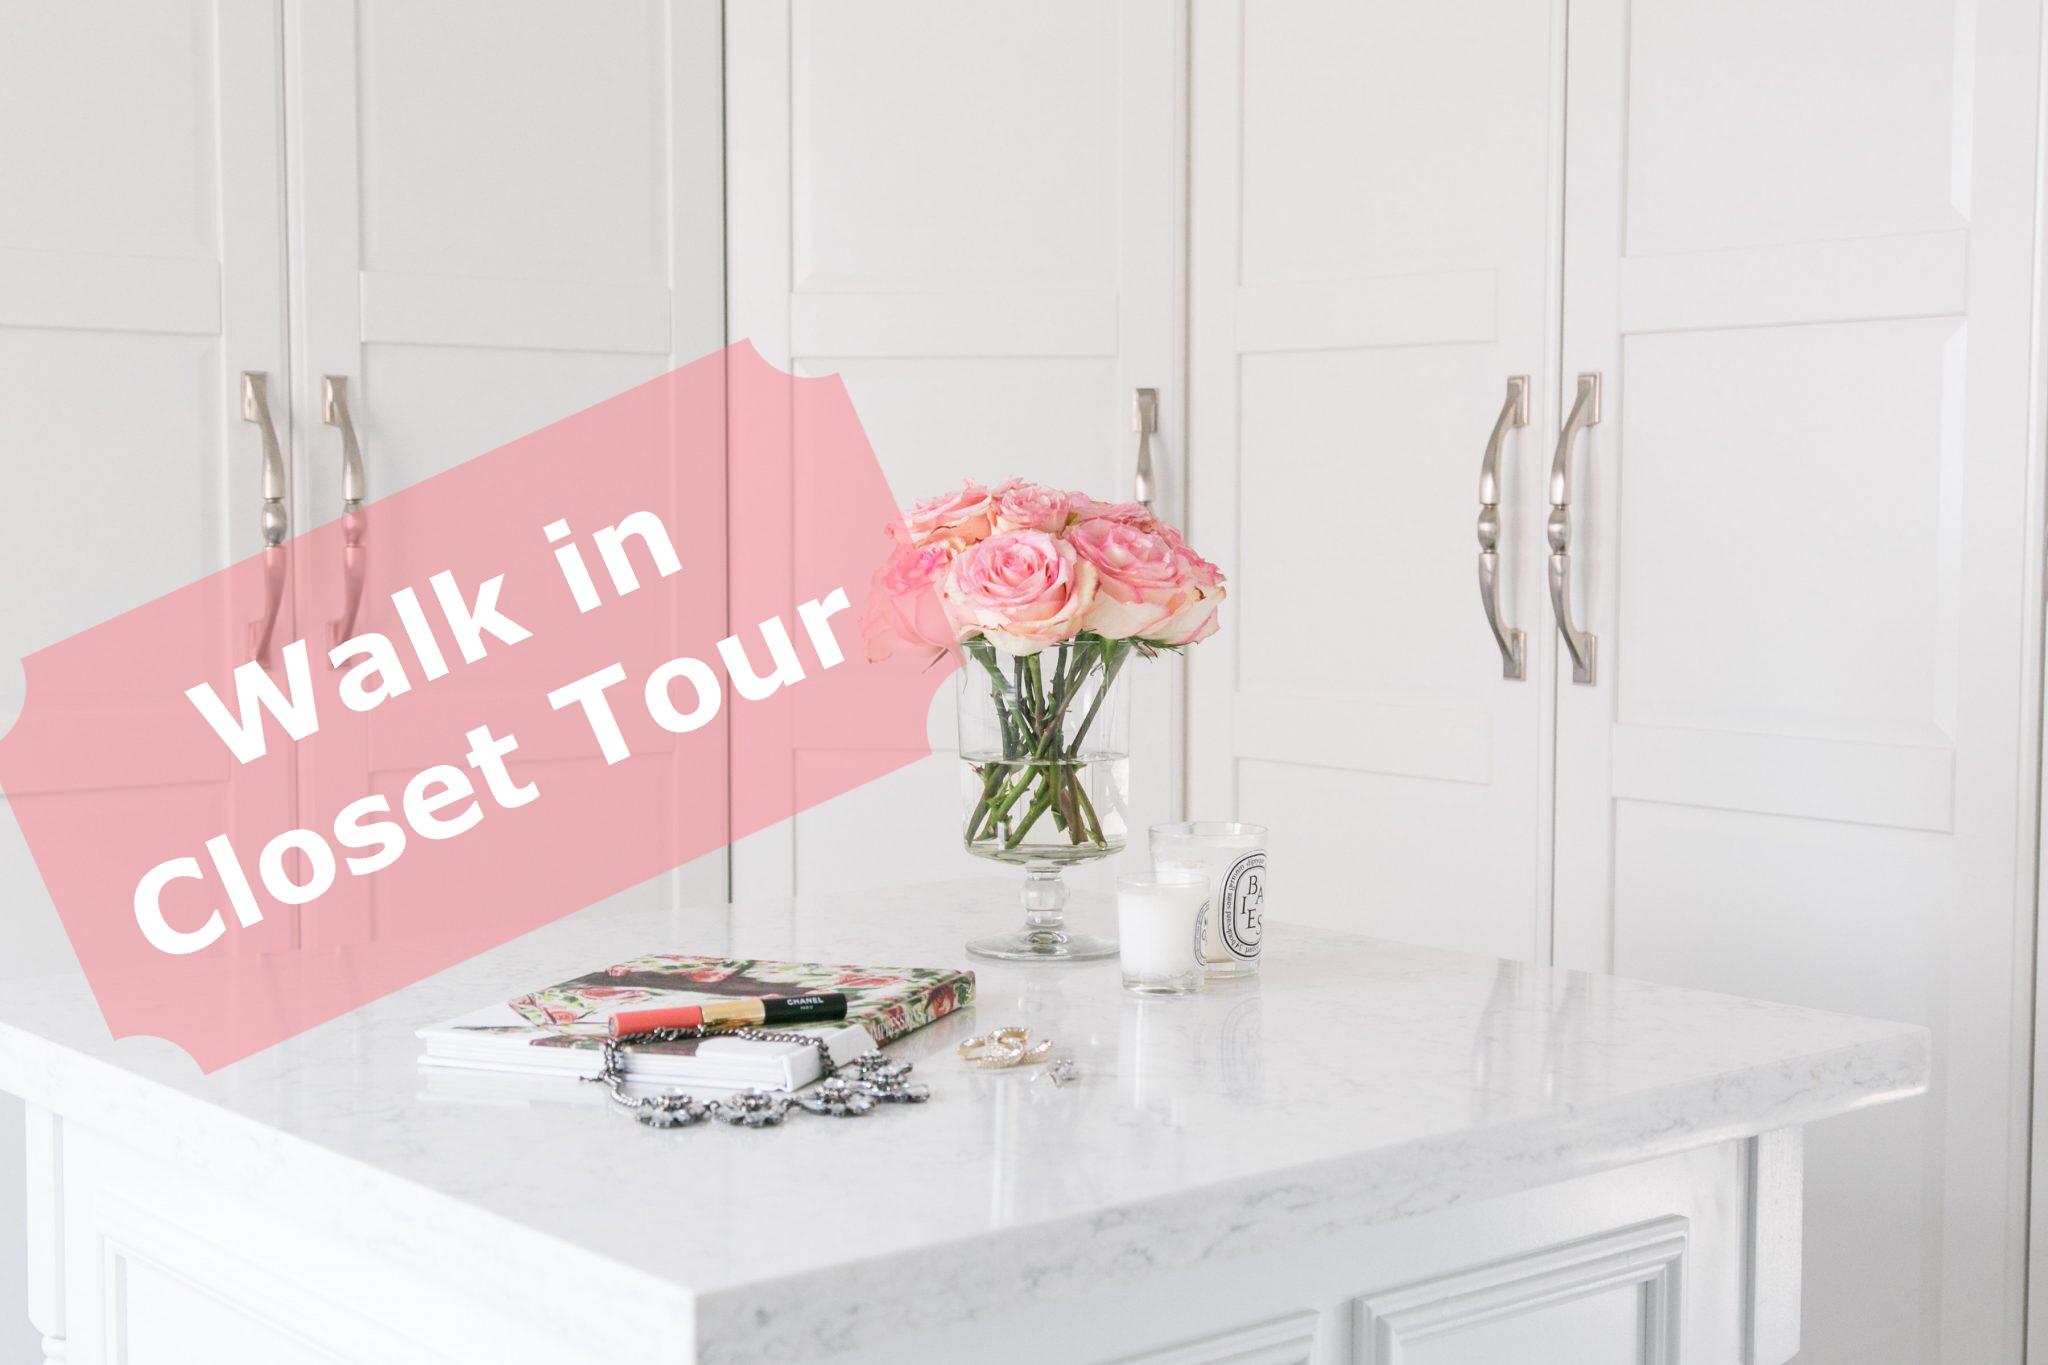 Video walk in closet tour ikea Pax Wardrobe hack sparkleshinylove